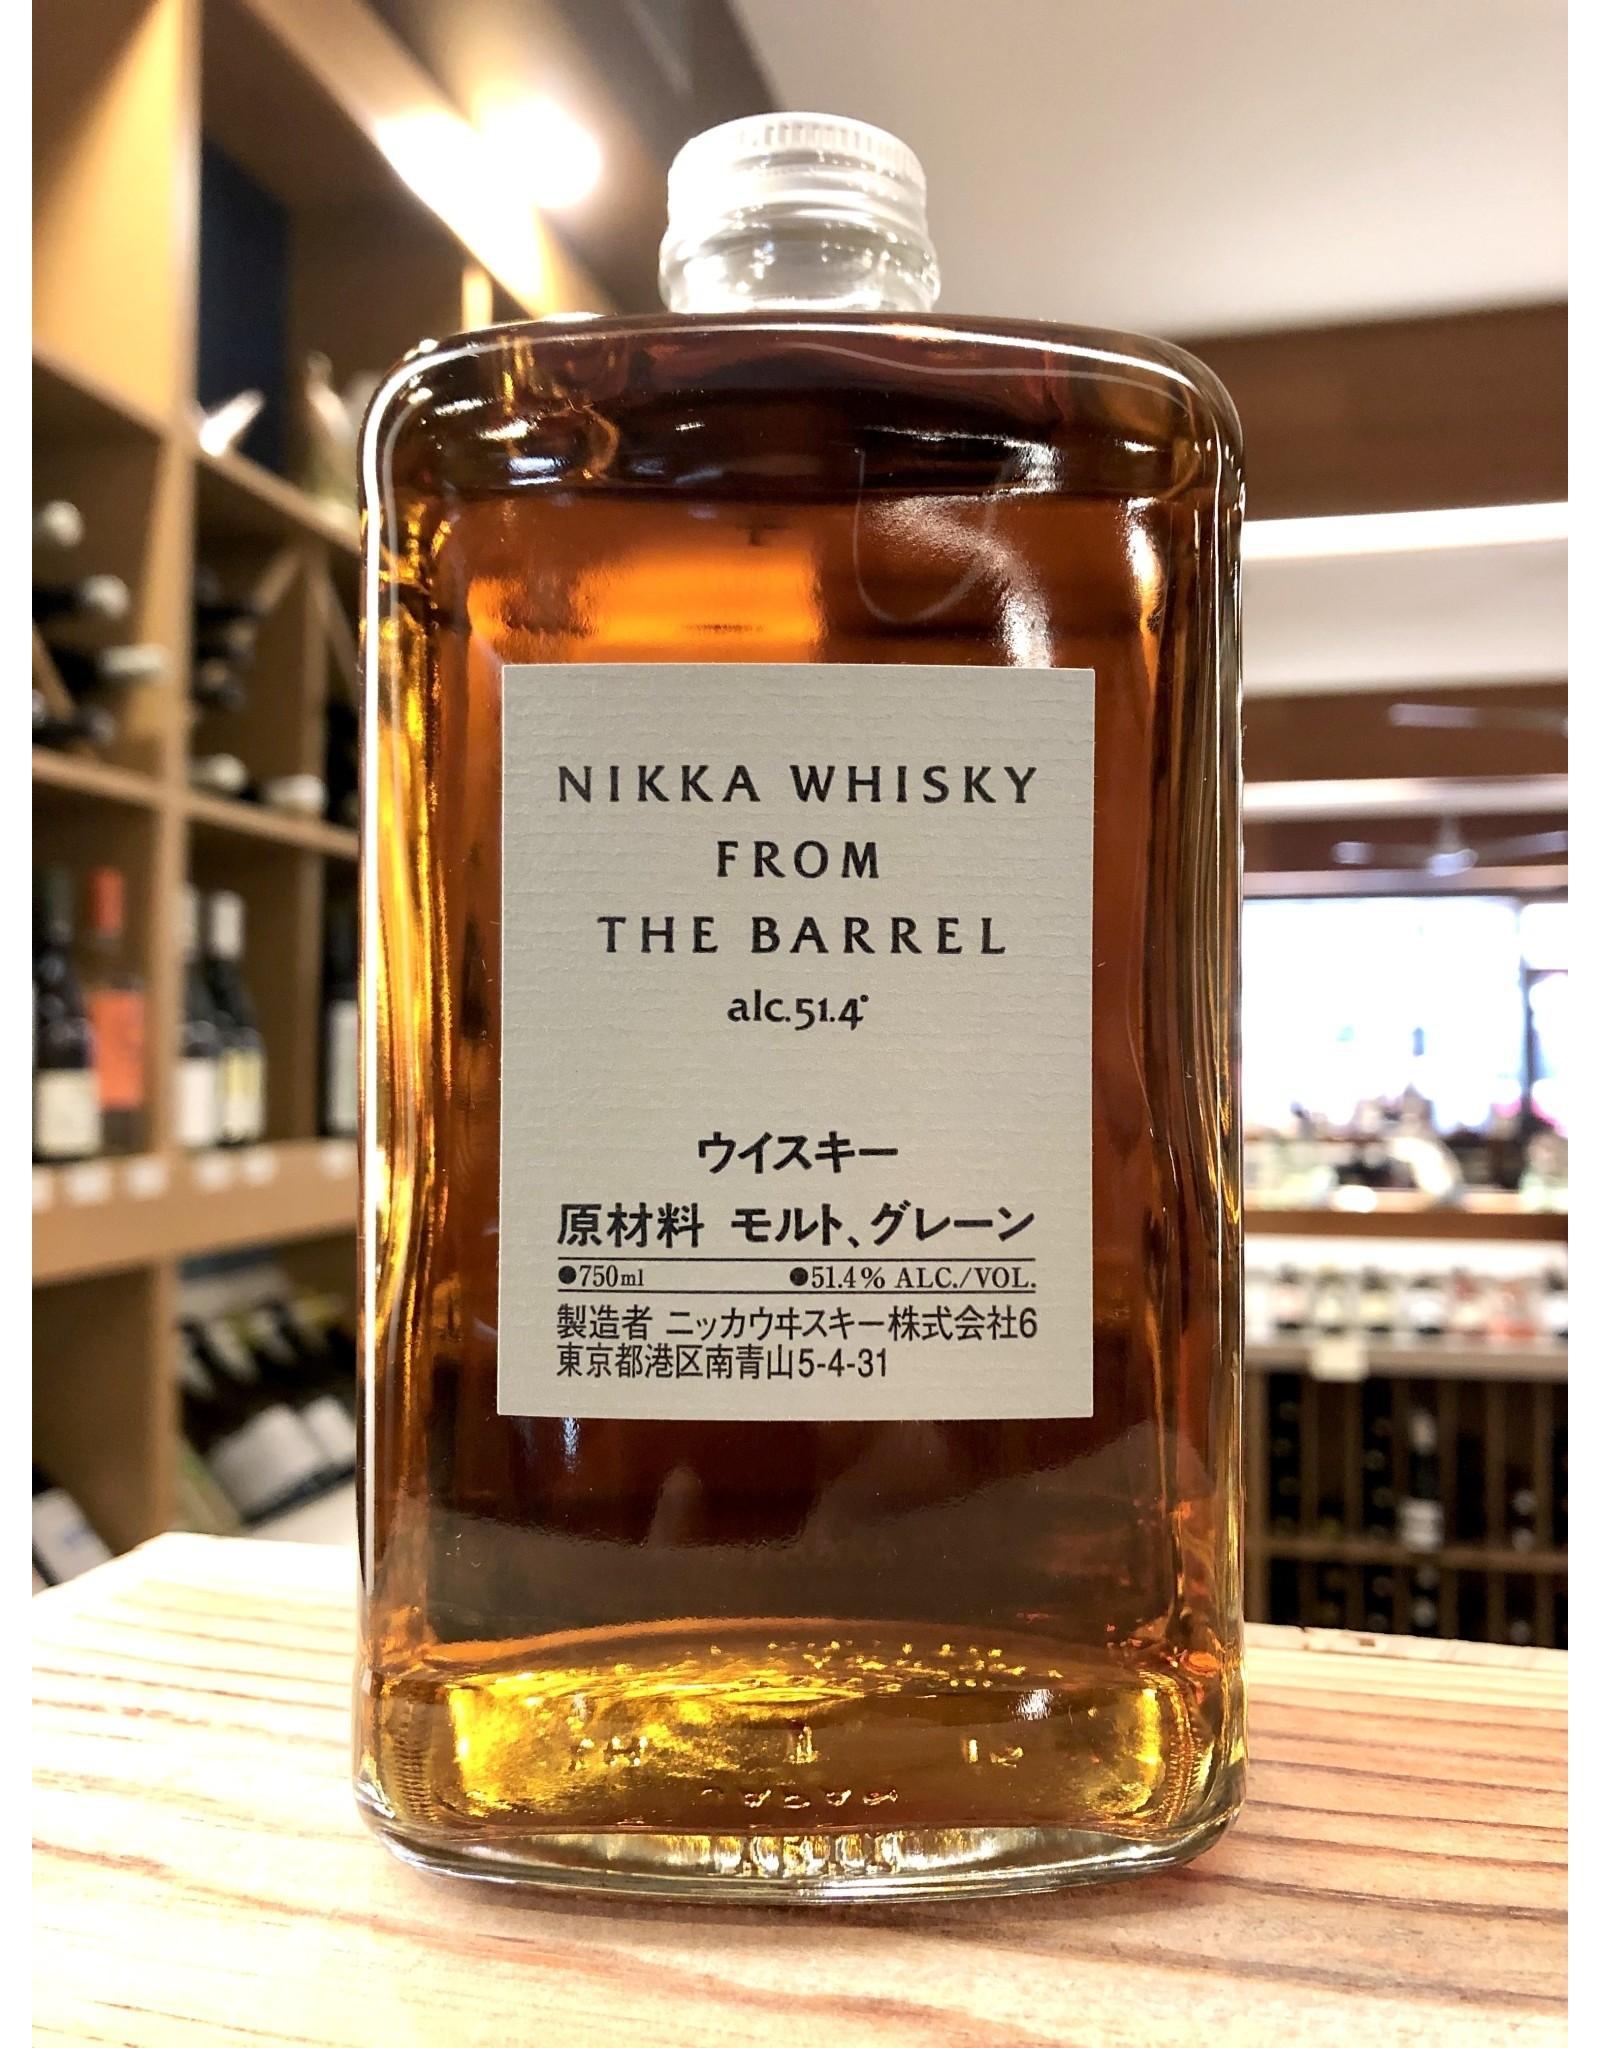 Nikka Whisky From The Barrel - 750 ML